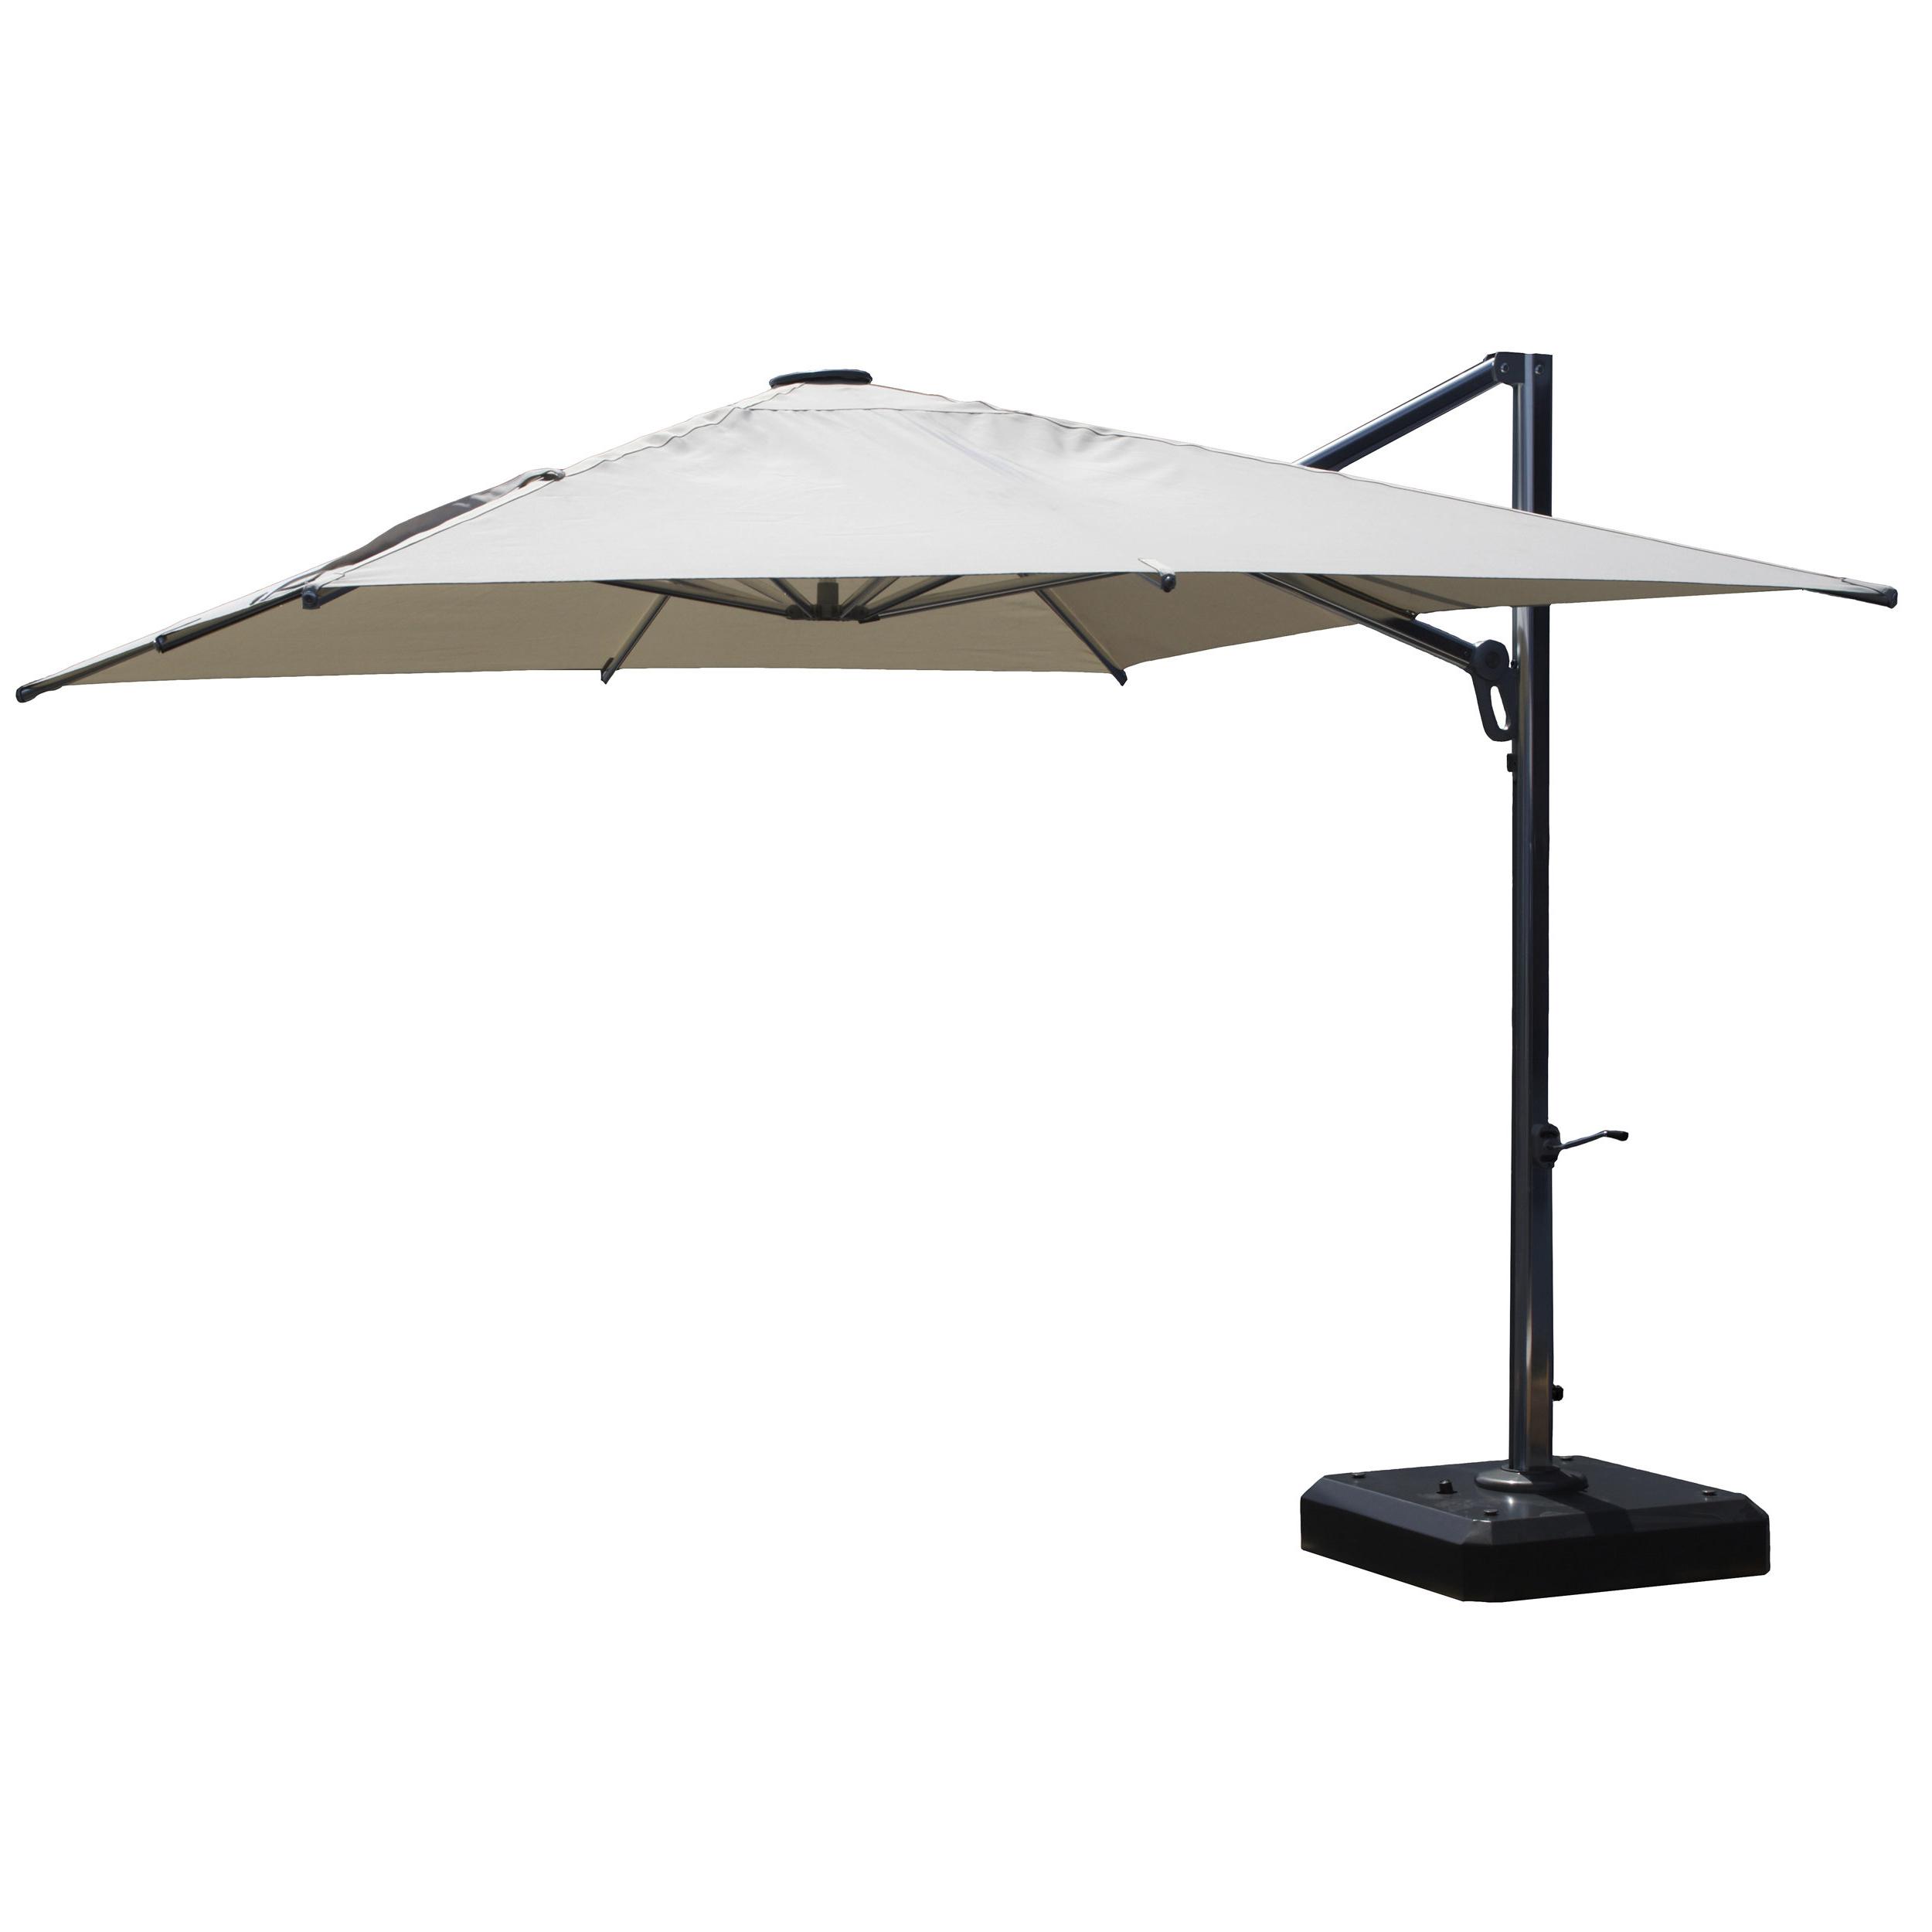 Current 10' Square Cantilever Umbrella In Spitler Square Cantilever Umbrellas (View 4 of 20)